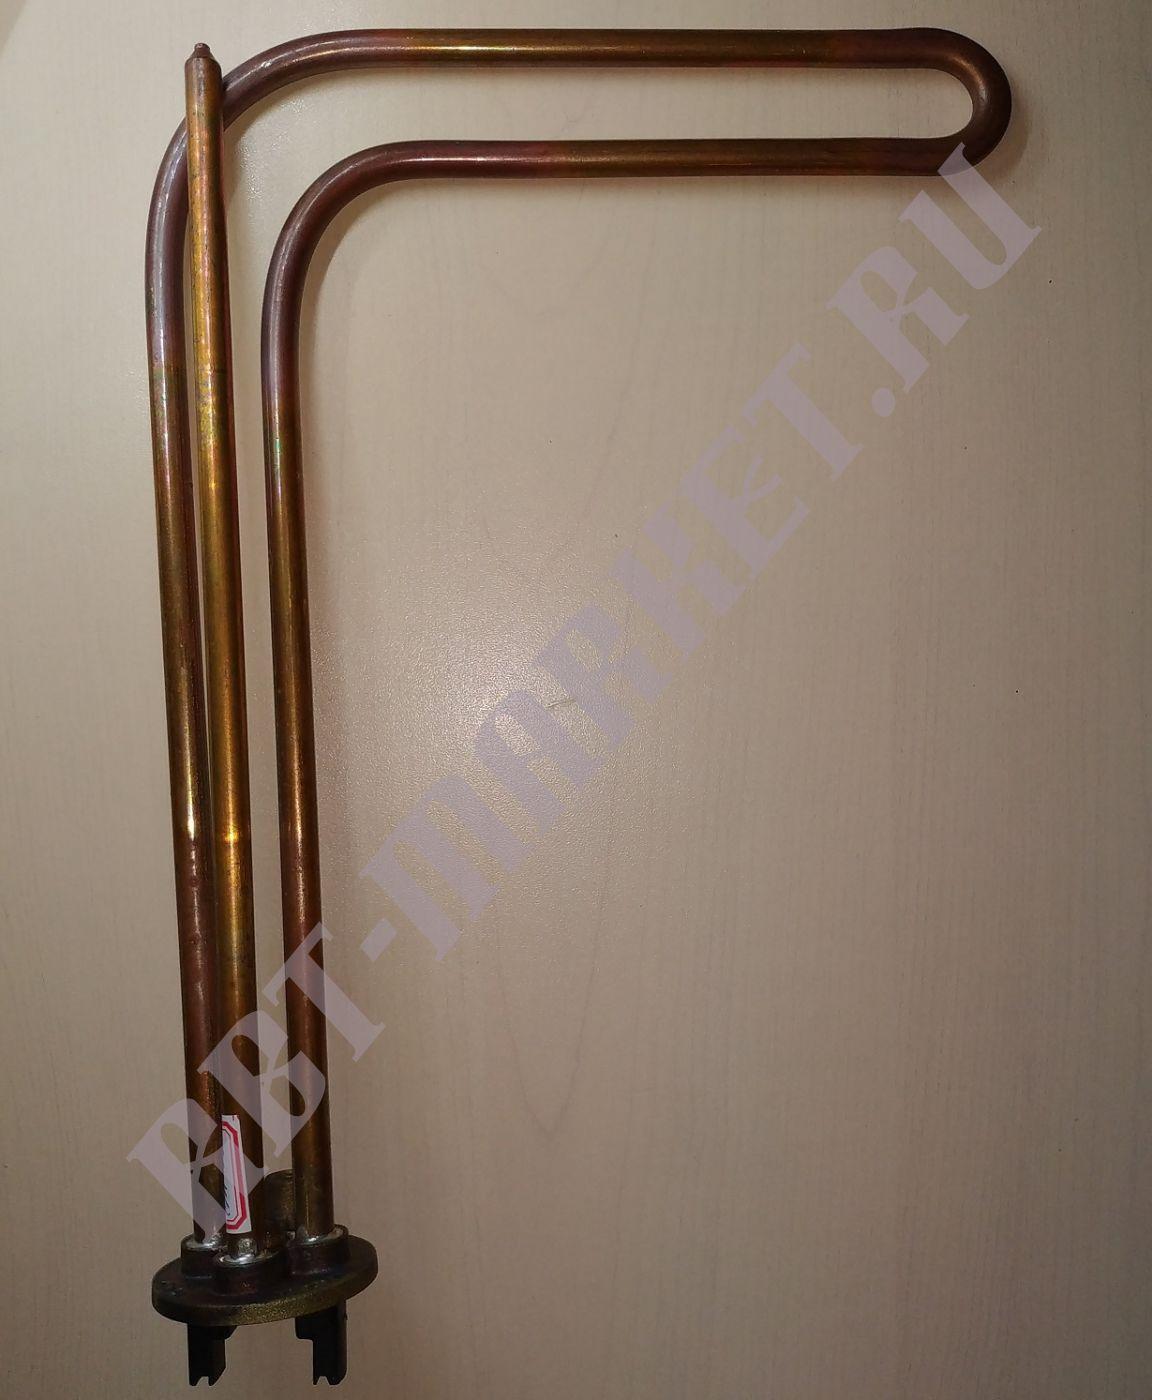 ТЭН для водонагревателя (бойлера) 1,5 КВТ 220V RCF OR PA L=290ММ АНОД М6 THERMOWATT